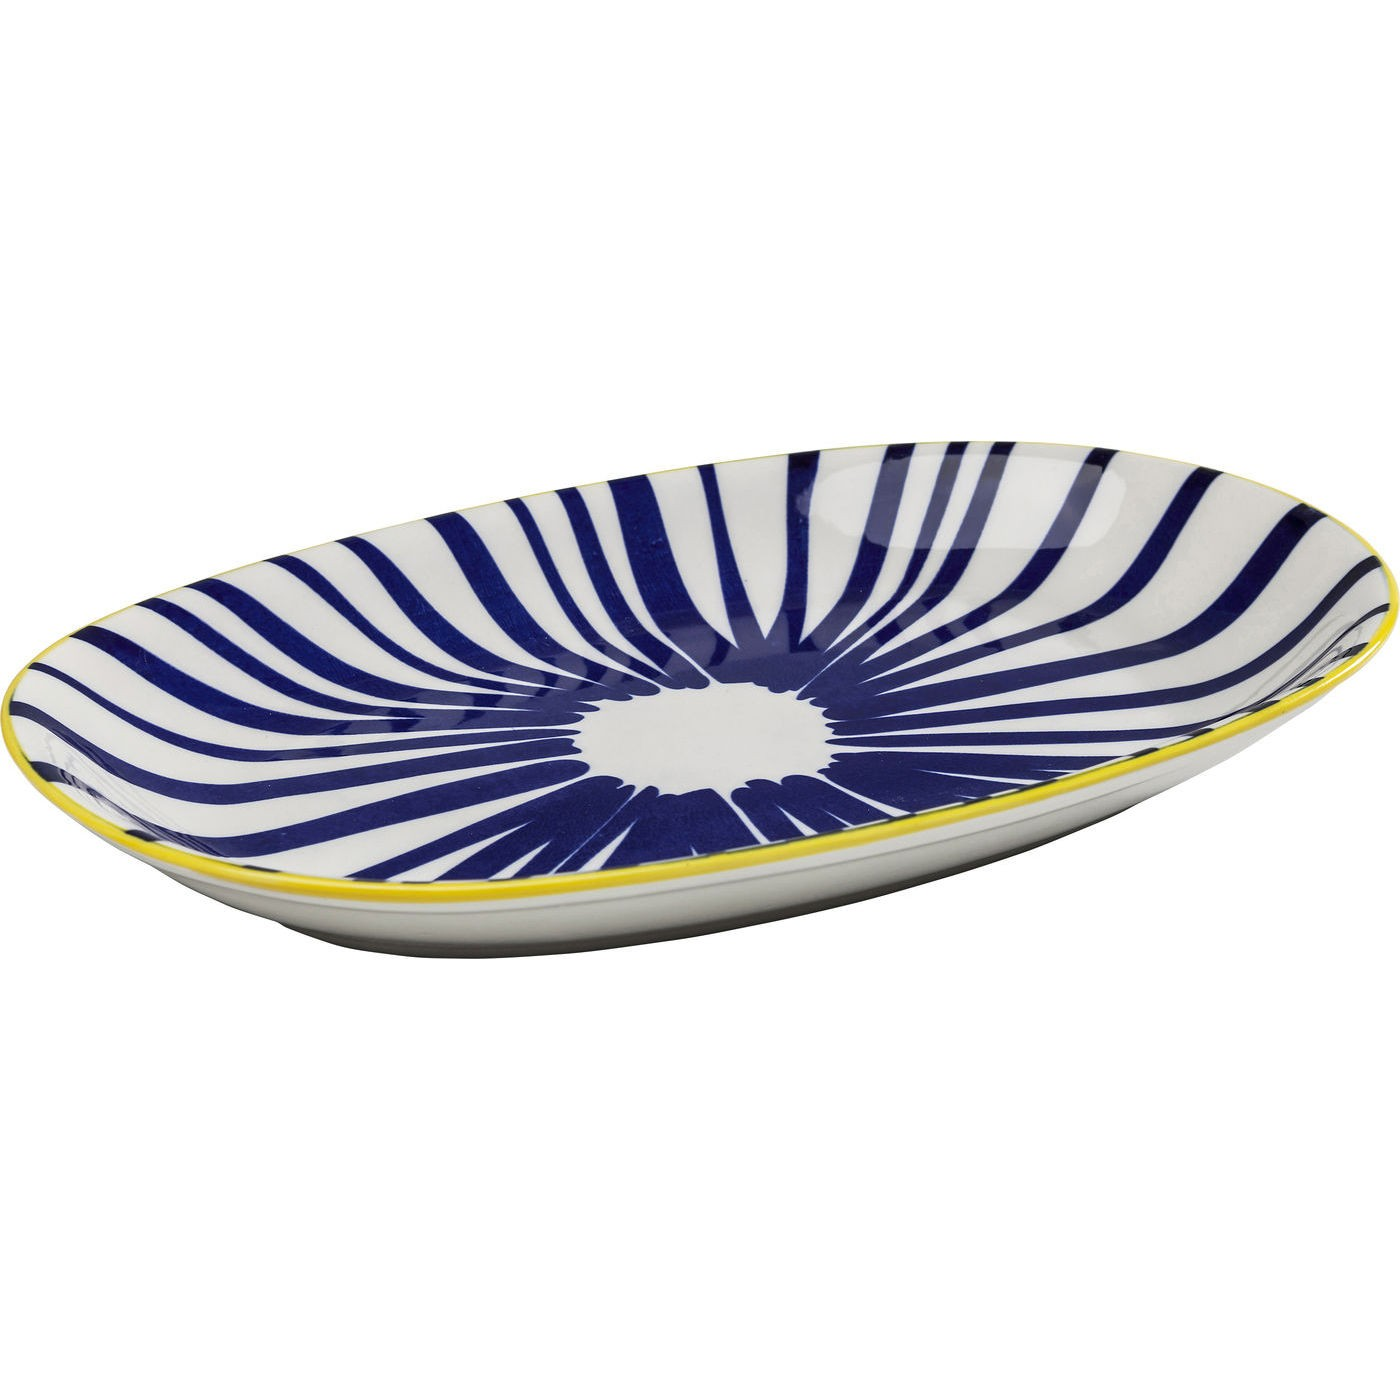 Plats Blu Ora ovales 24cm set de 2 Kare Design